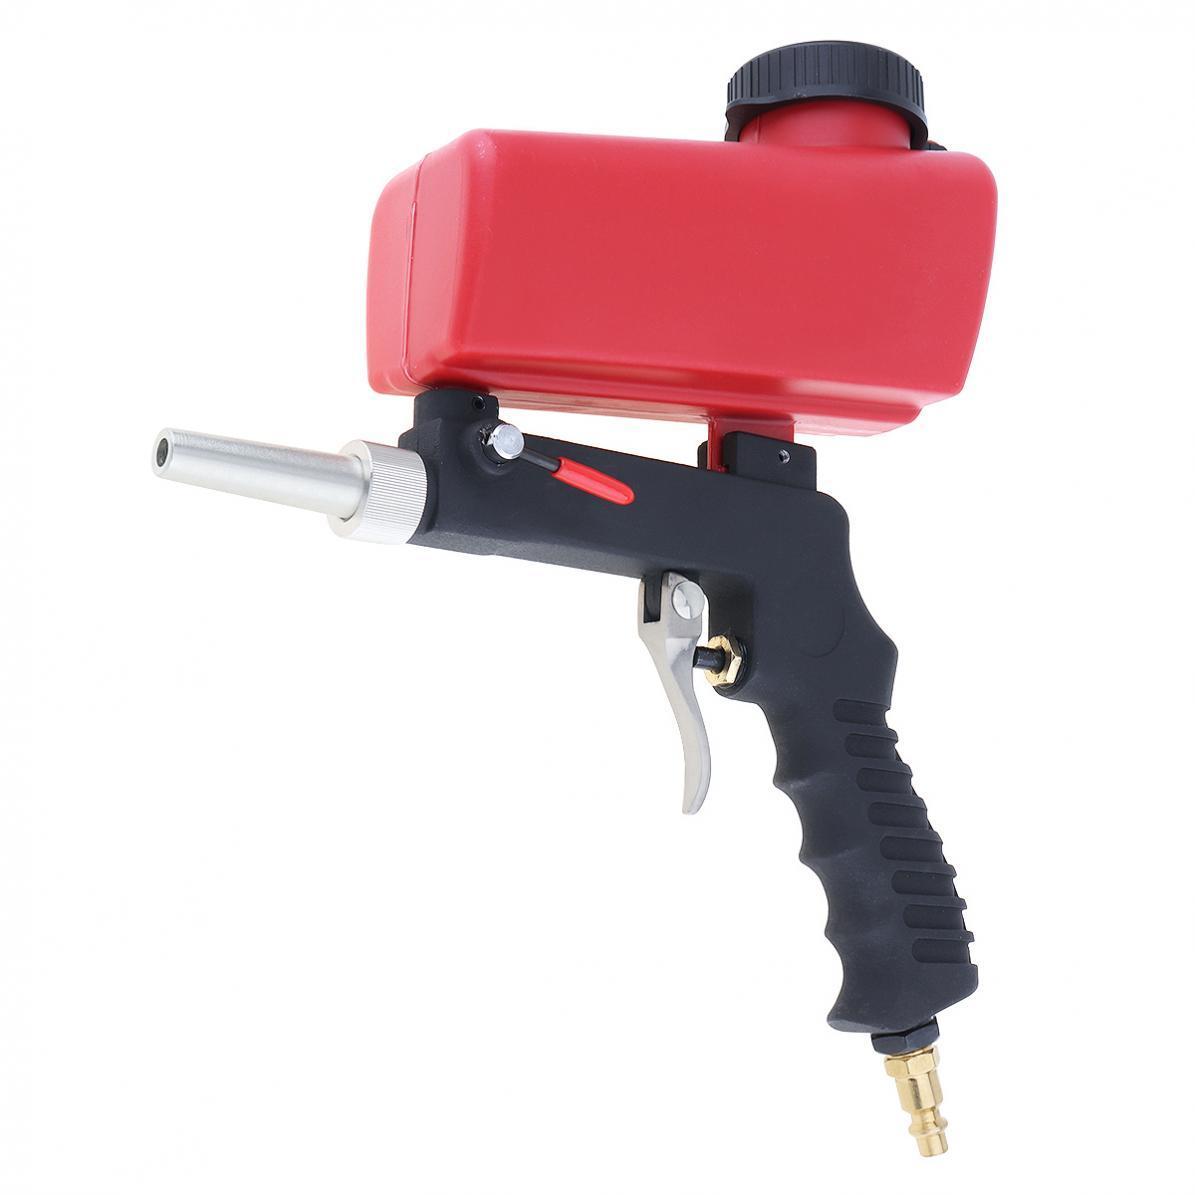 OUTOP Portable Gravity Sandblasting Tool Pneumatic Small Sand Blasting Machine(Red)